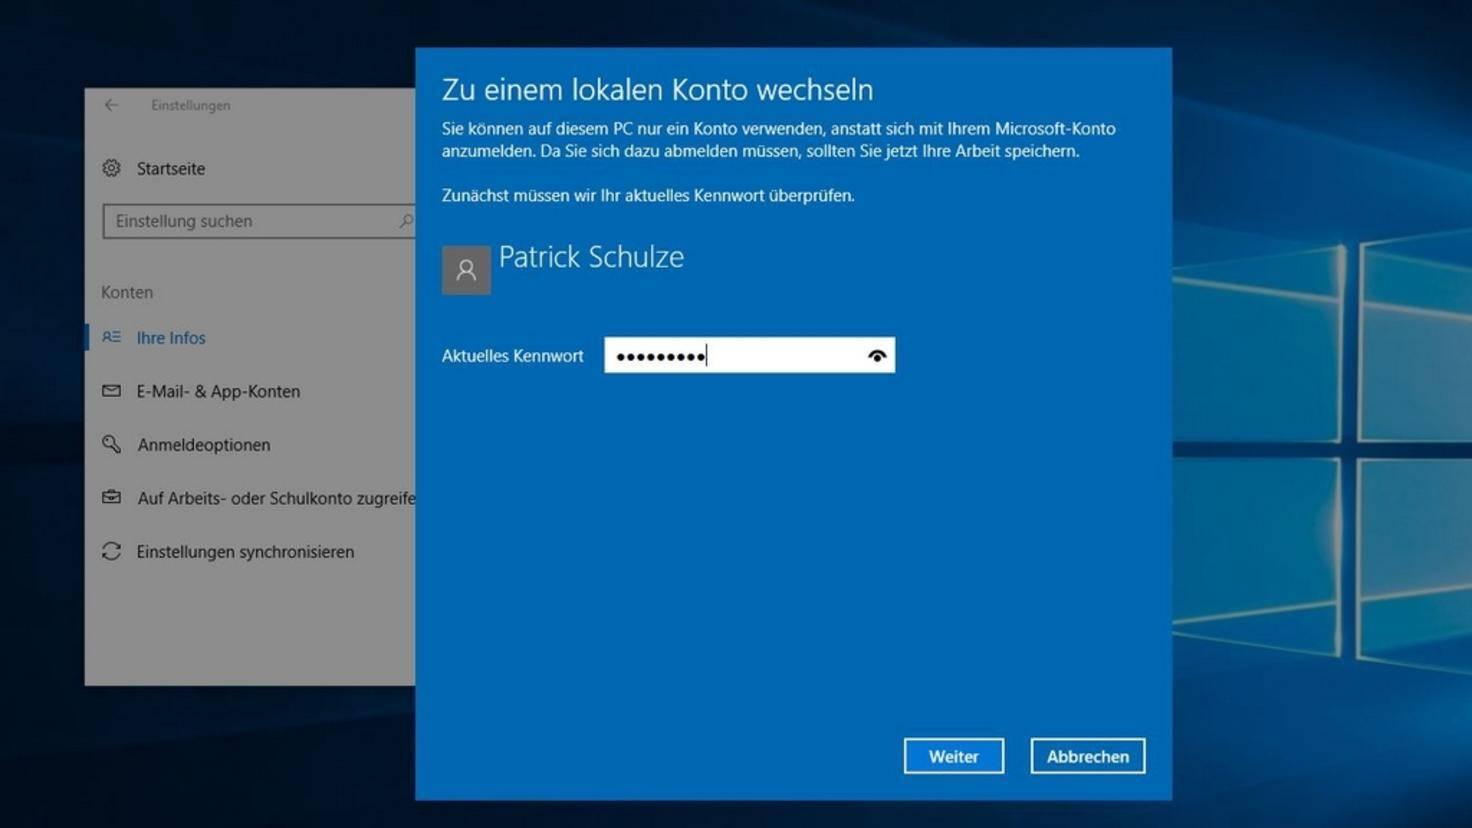 Microsoft-Konto-02